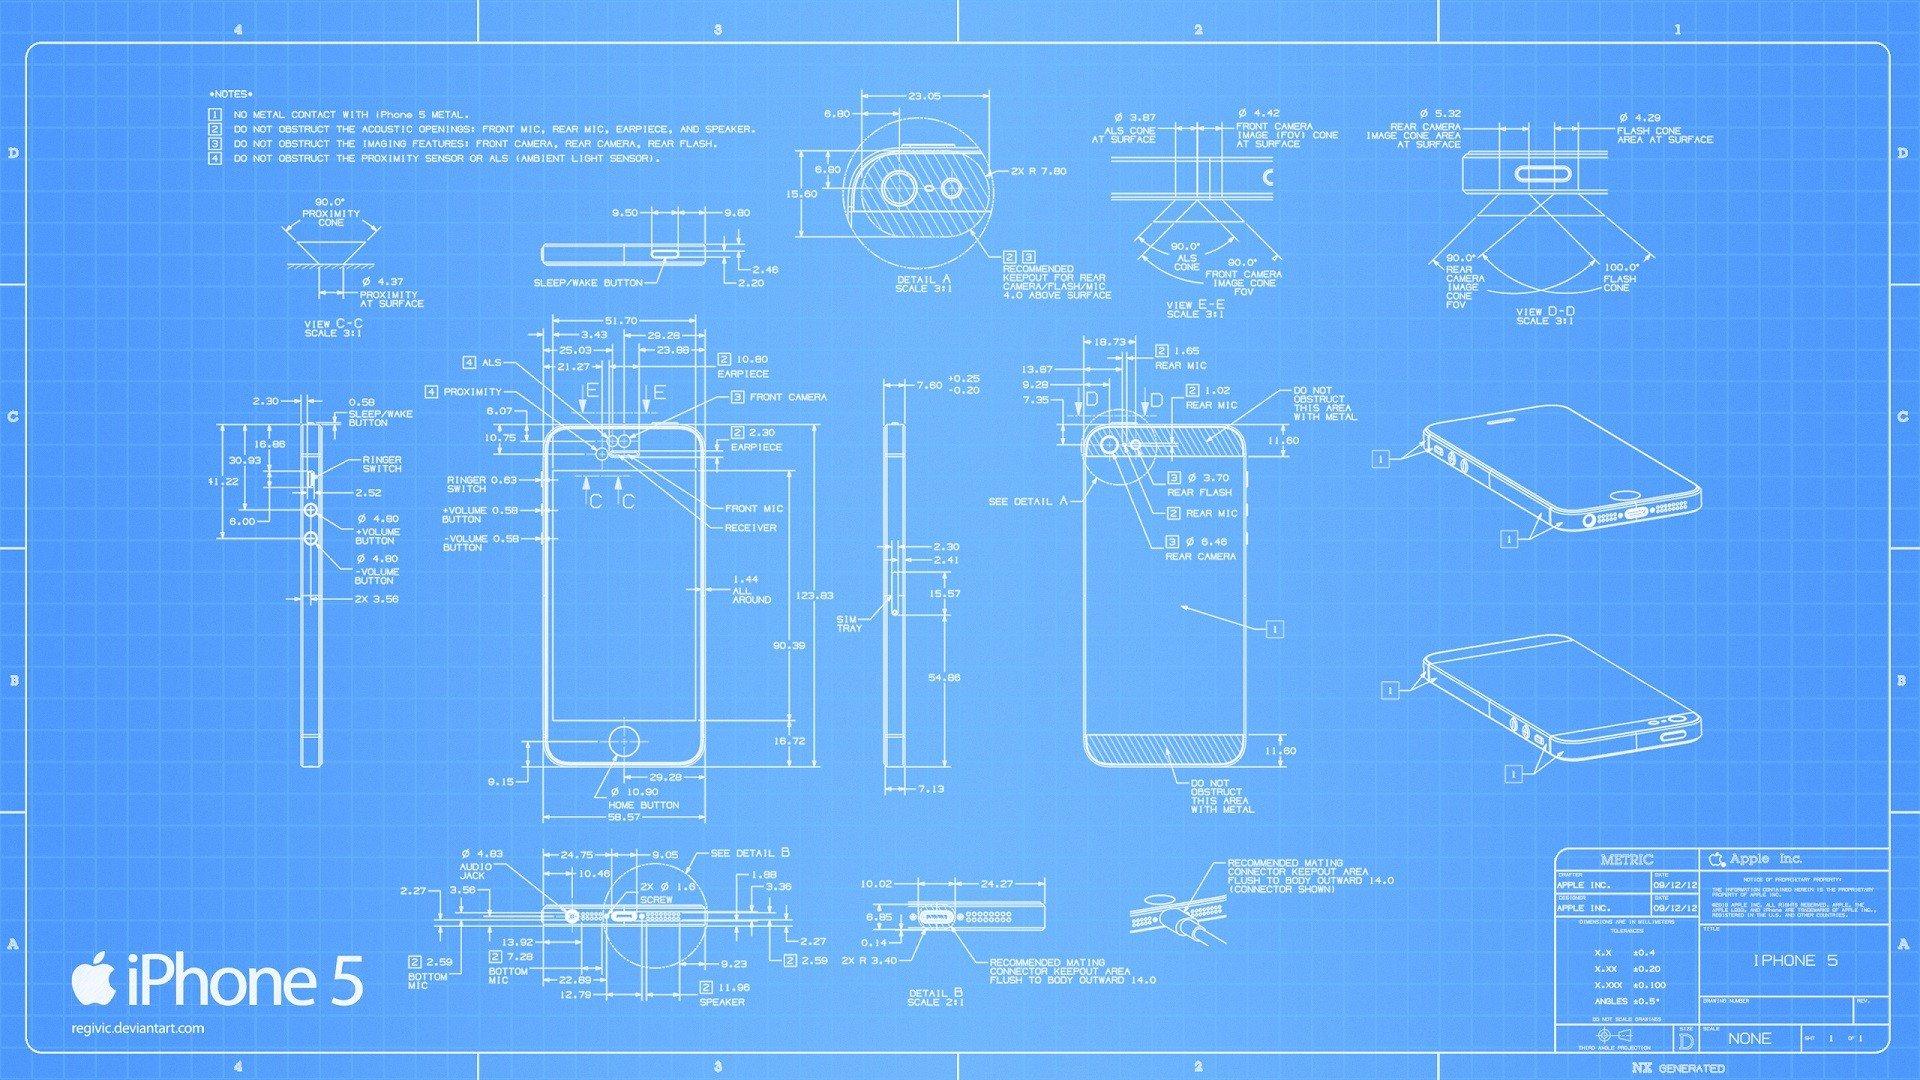 DeviantART blueprints iPhone 5 wallpaper background 1920x1080